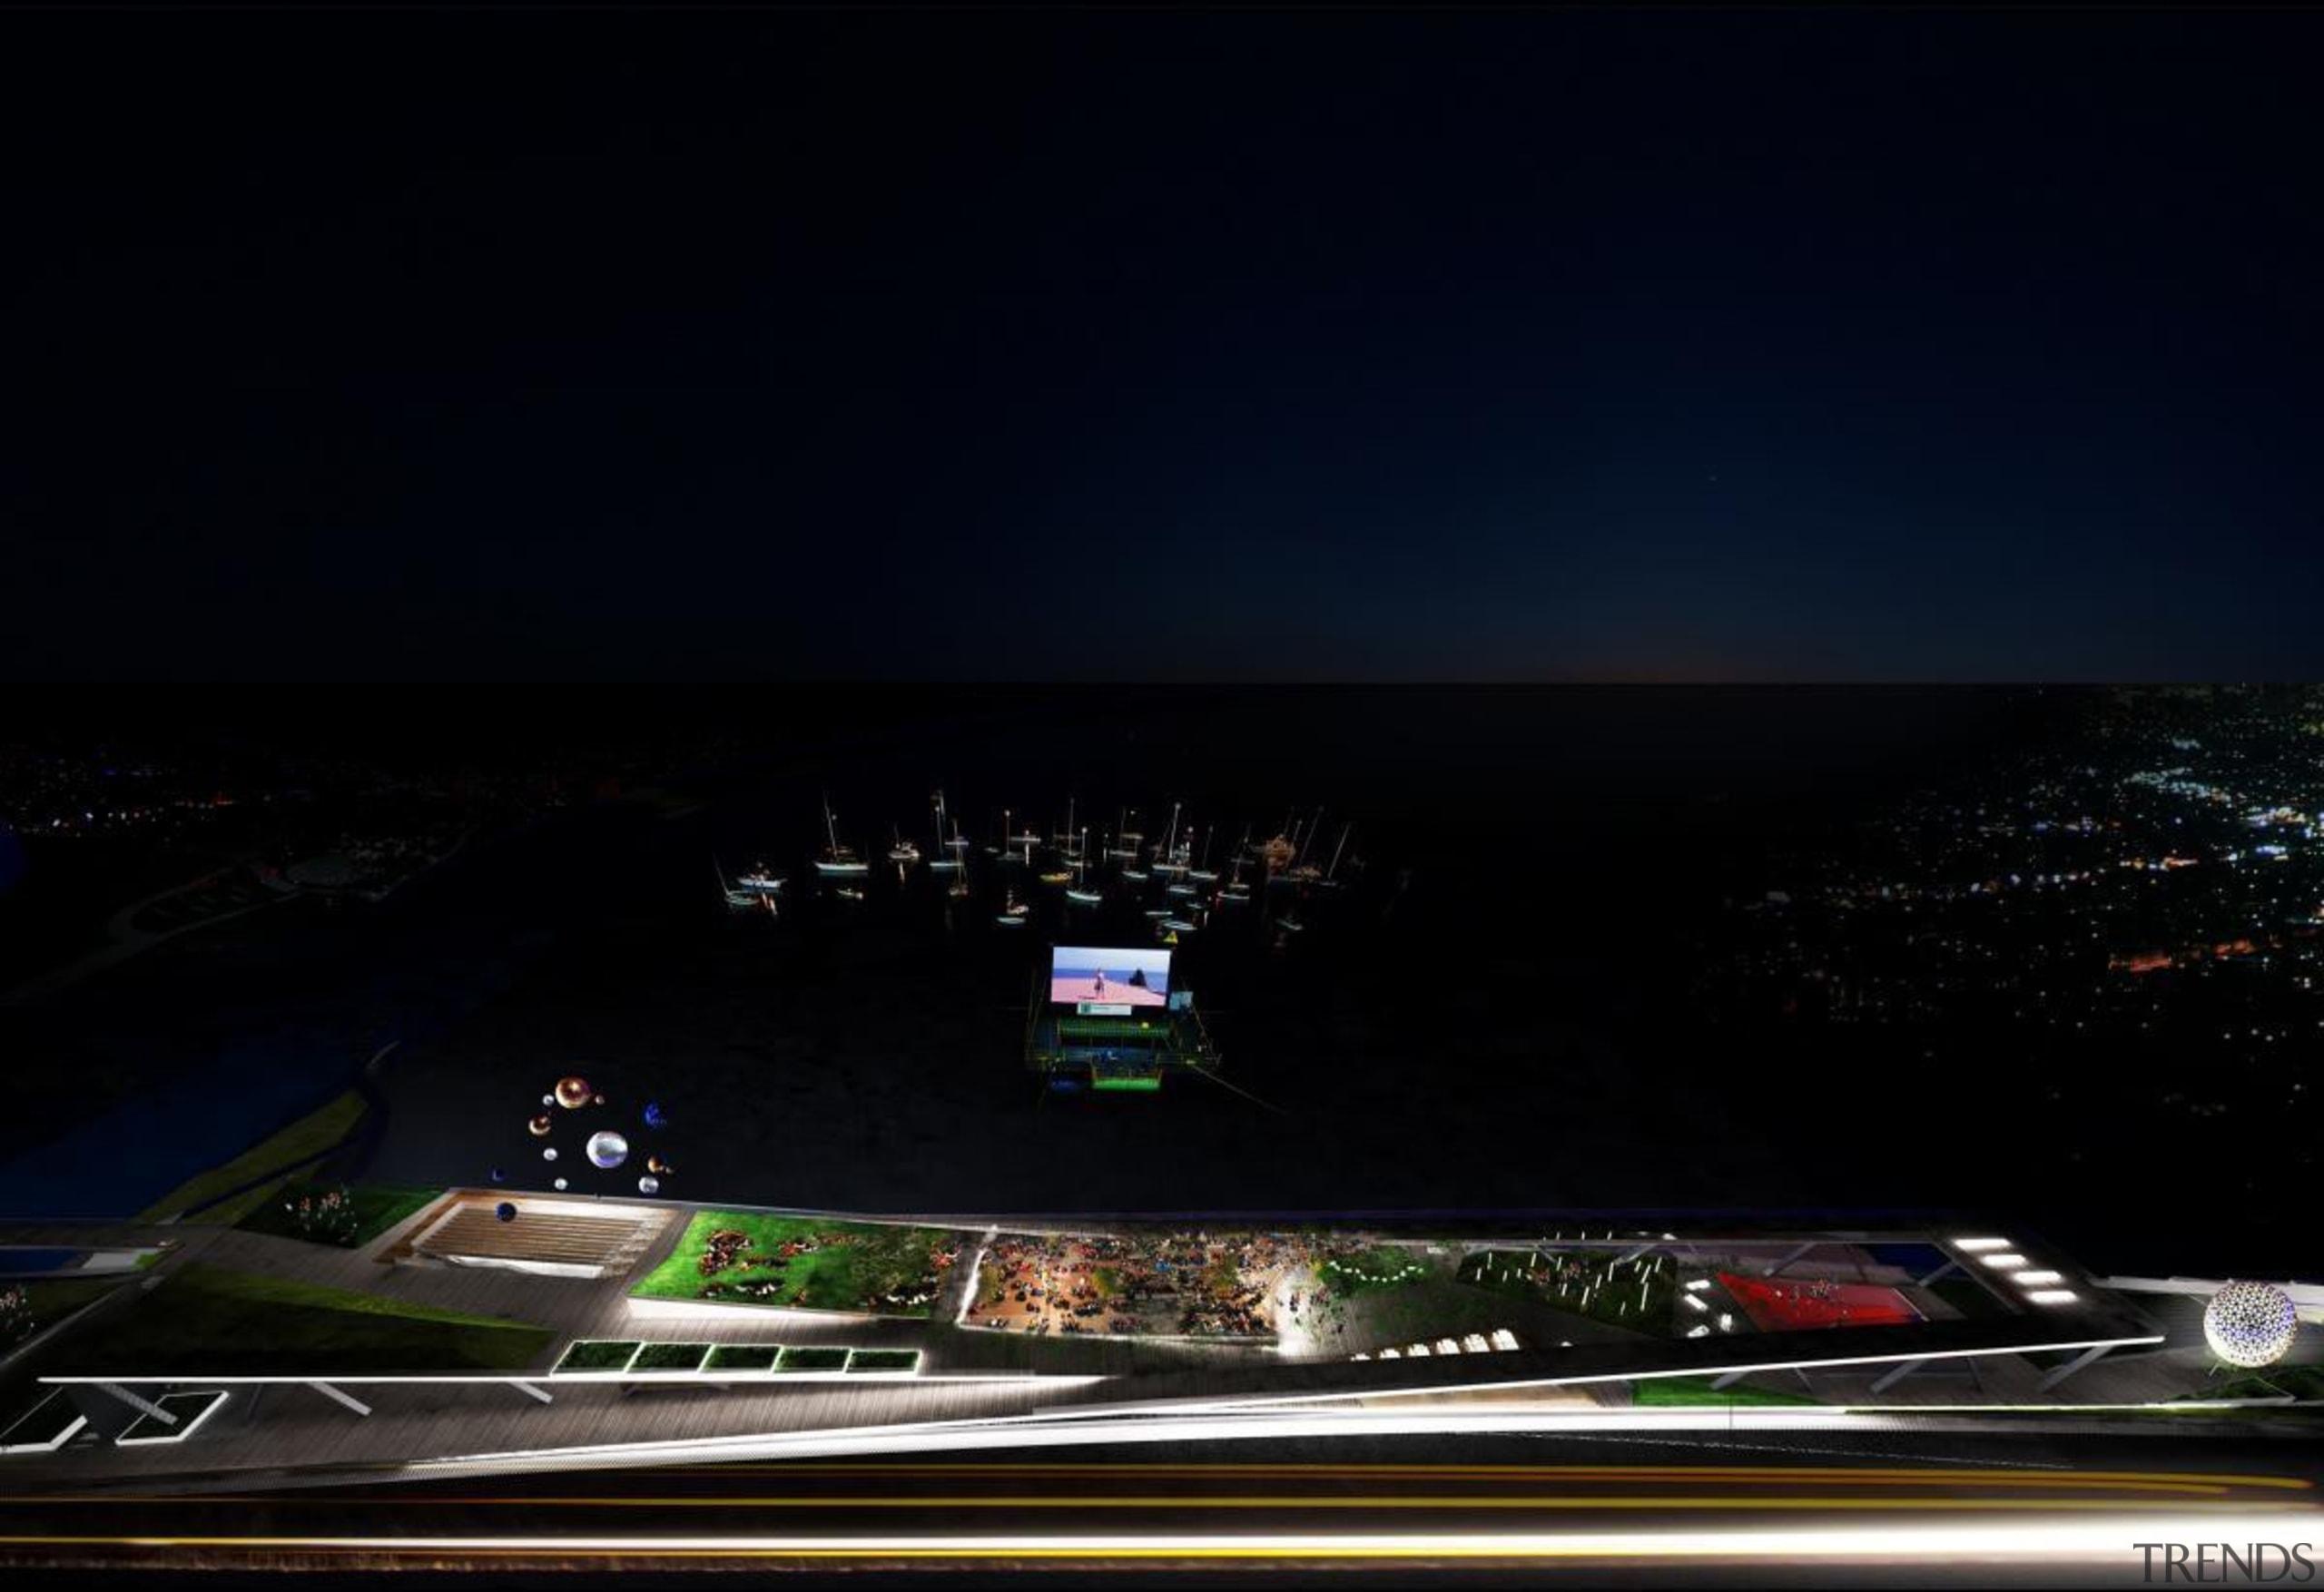 High line park - High line park - atmosphere, atmosphere of earth, automotive design, night, phenomenon, sky, black